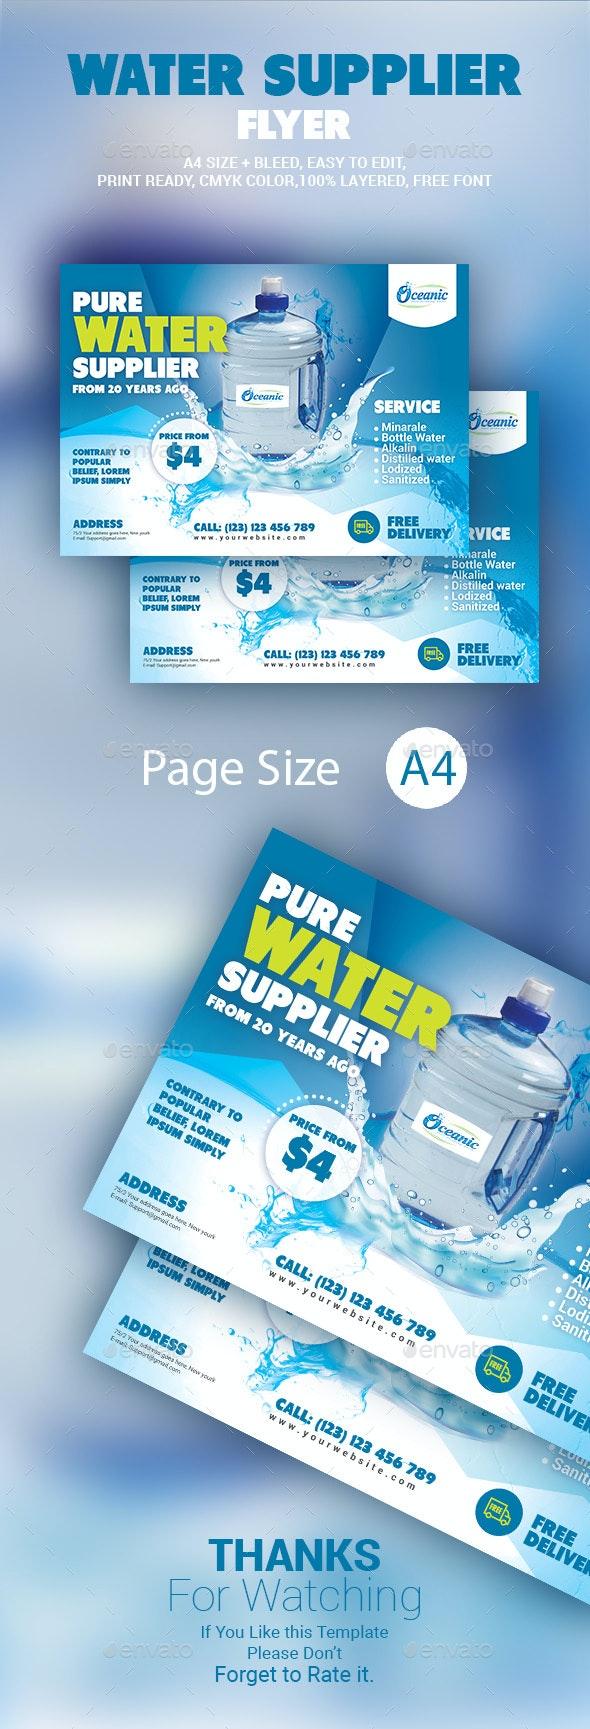 Water Supplier Flyer - Commerce Flyers